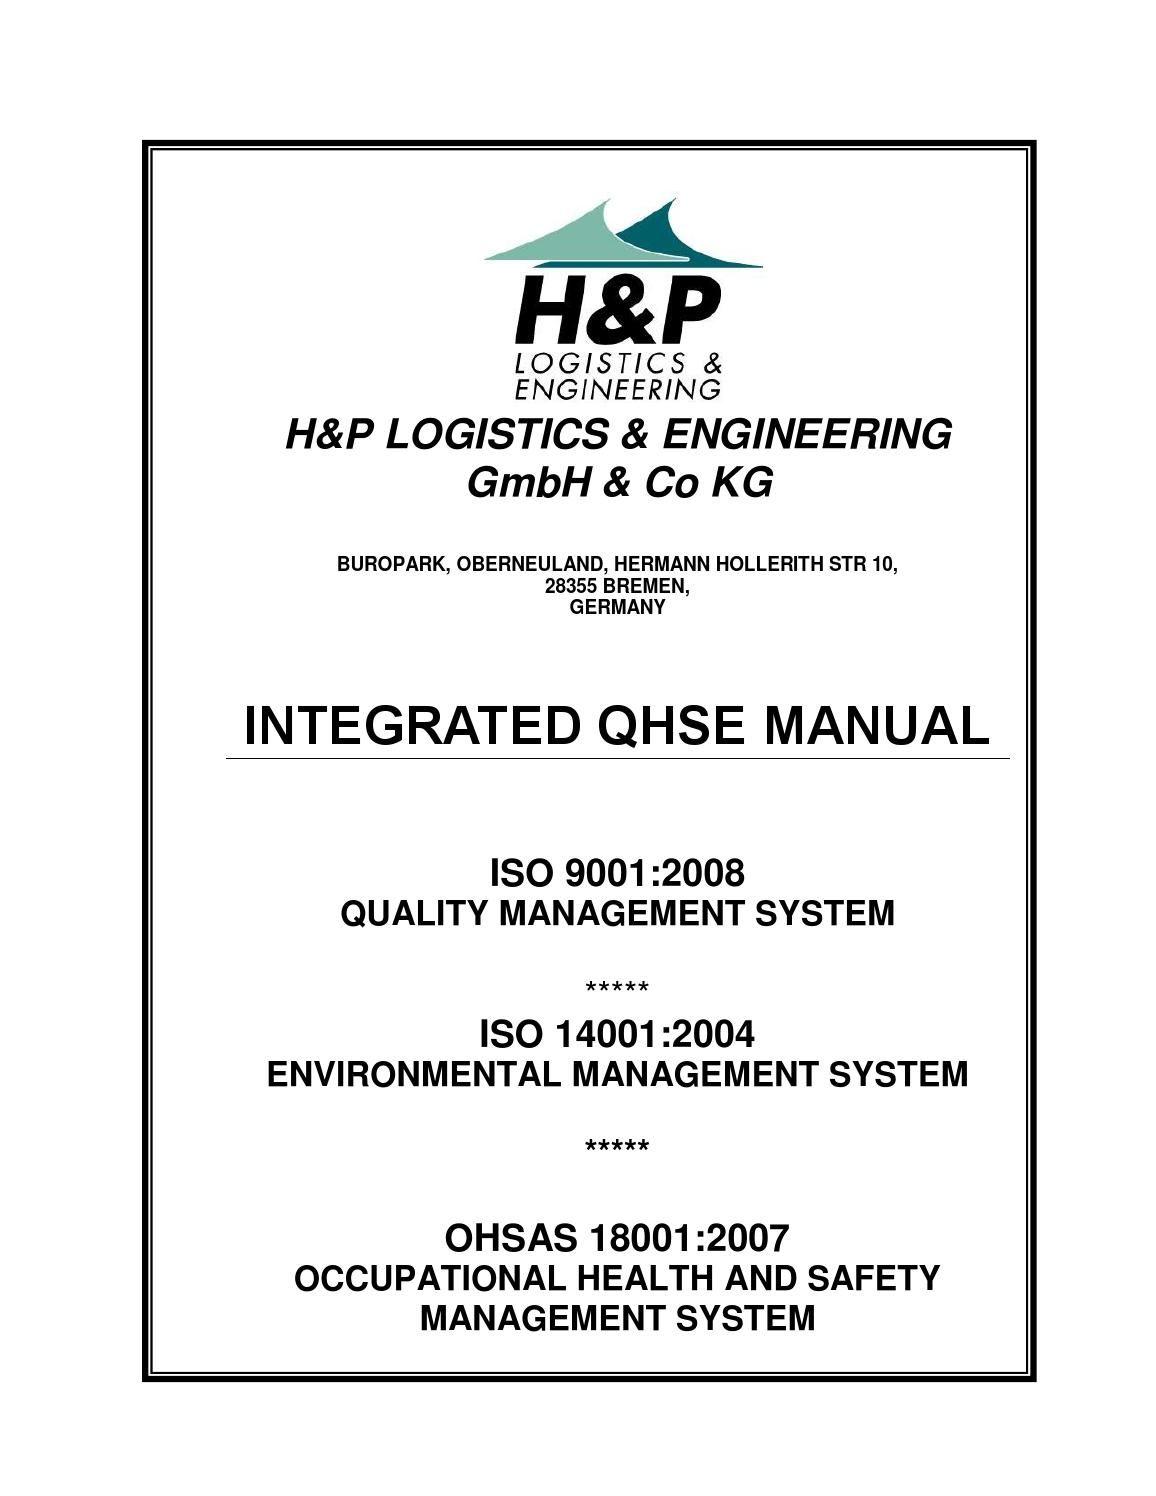 qhse_manual_rev_02 Environmental management system